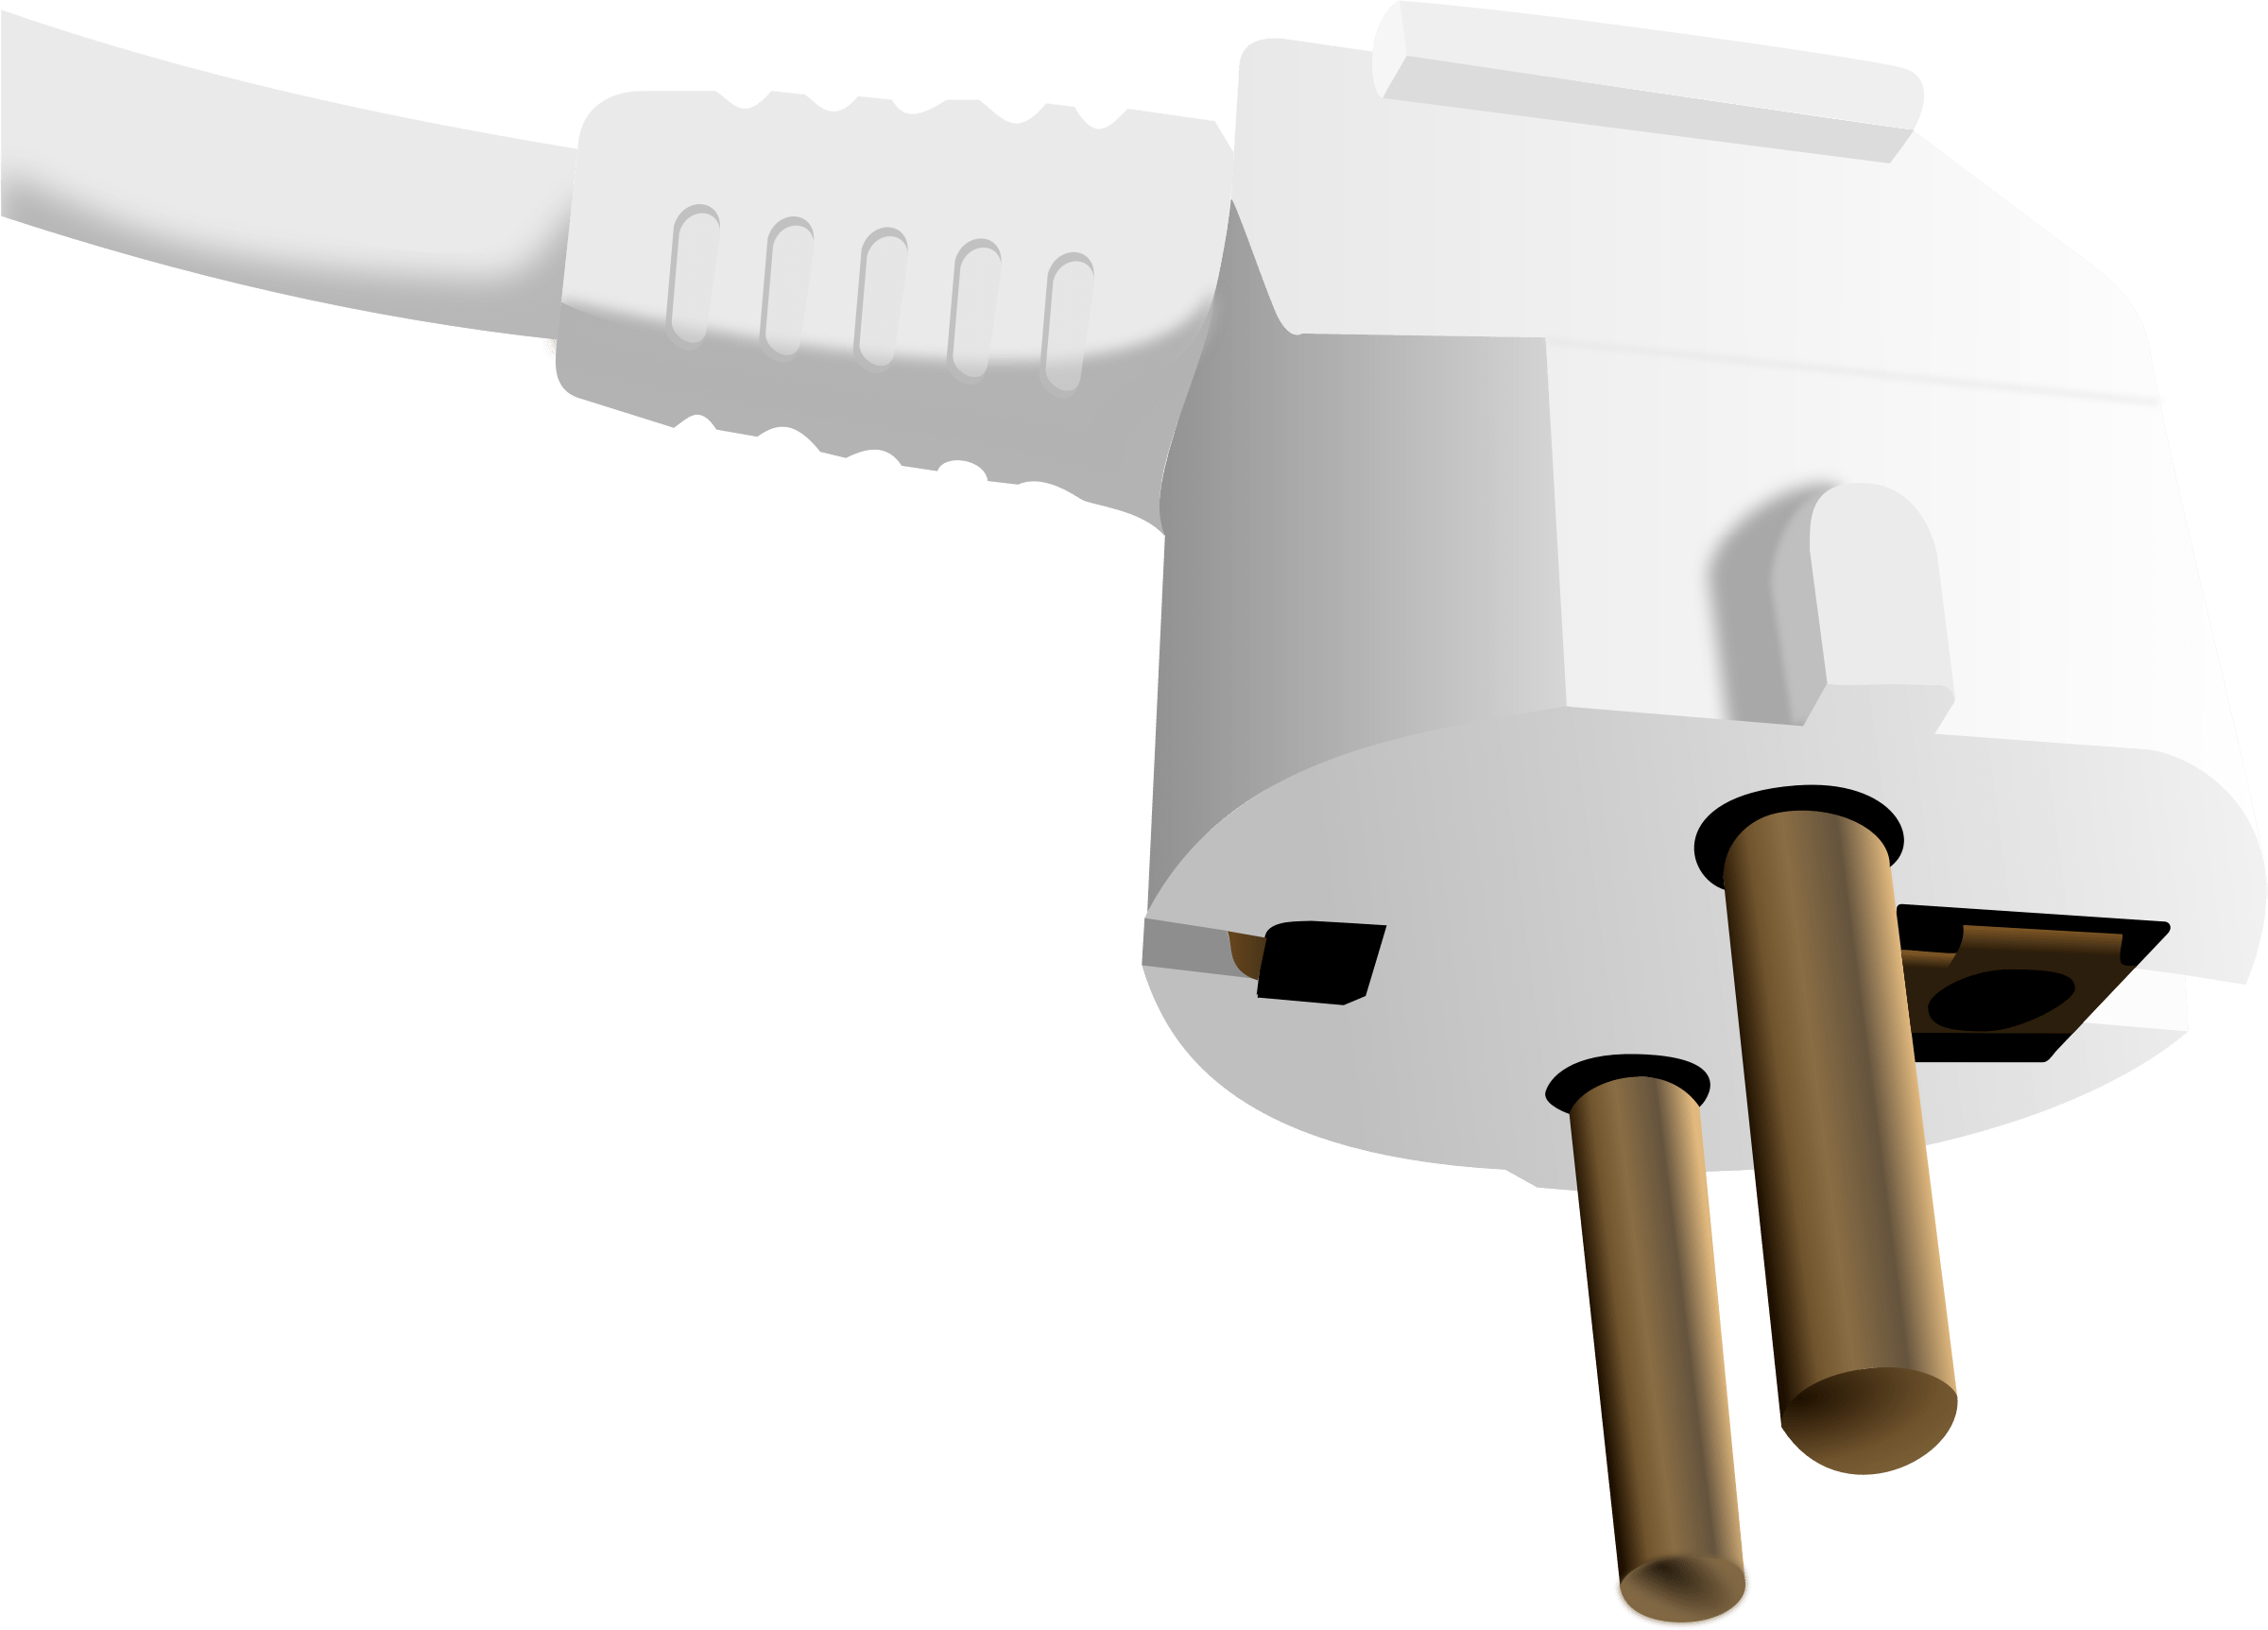 Hand unplugging plugs transparent. Plug clipart extension